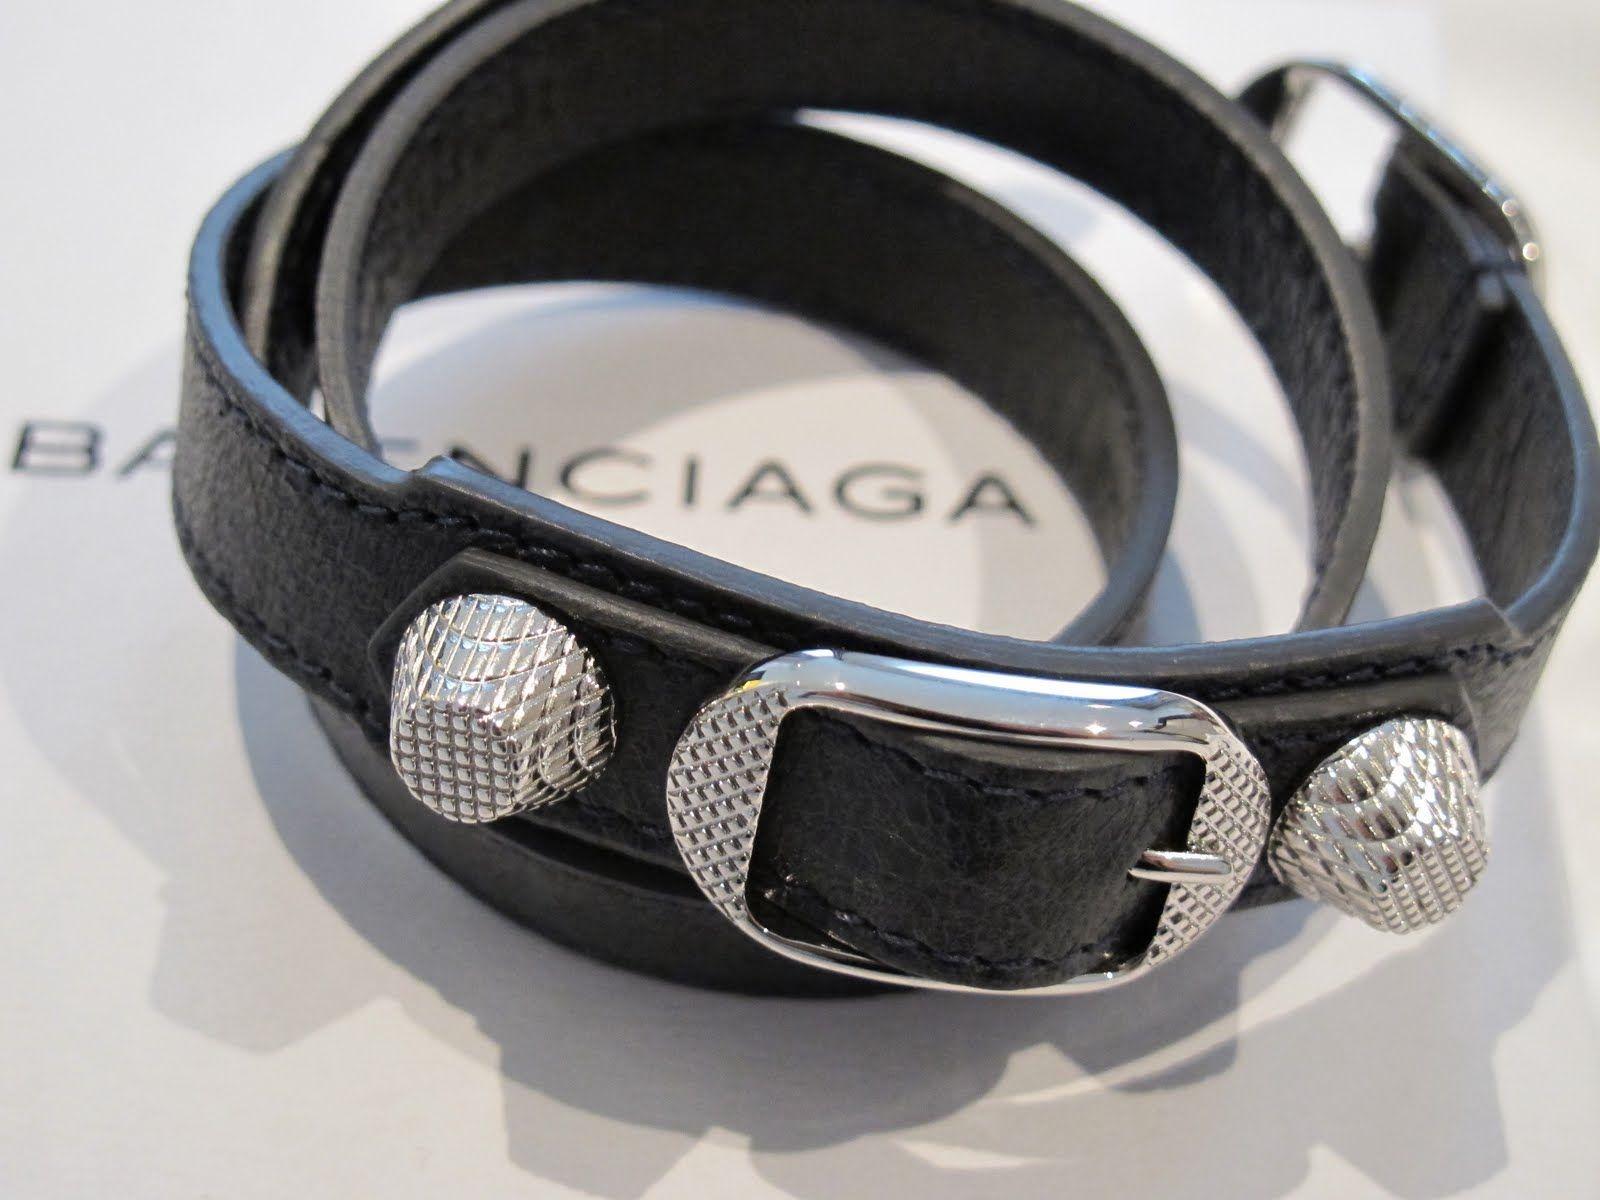 Balenciaga Bracelet My Wish List All Black Belts Arm